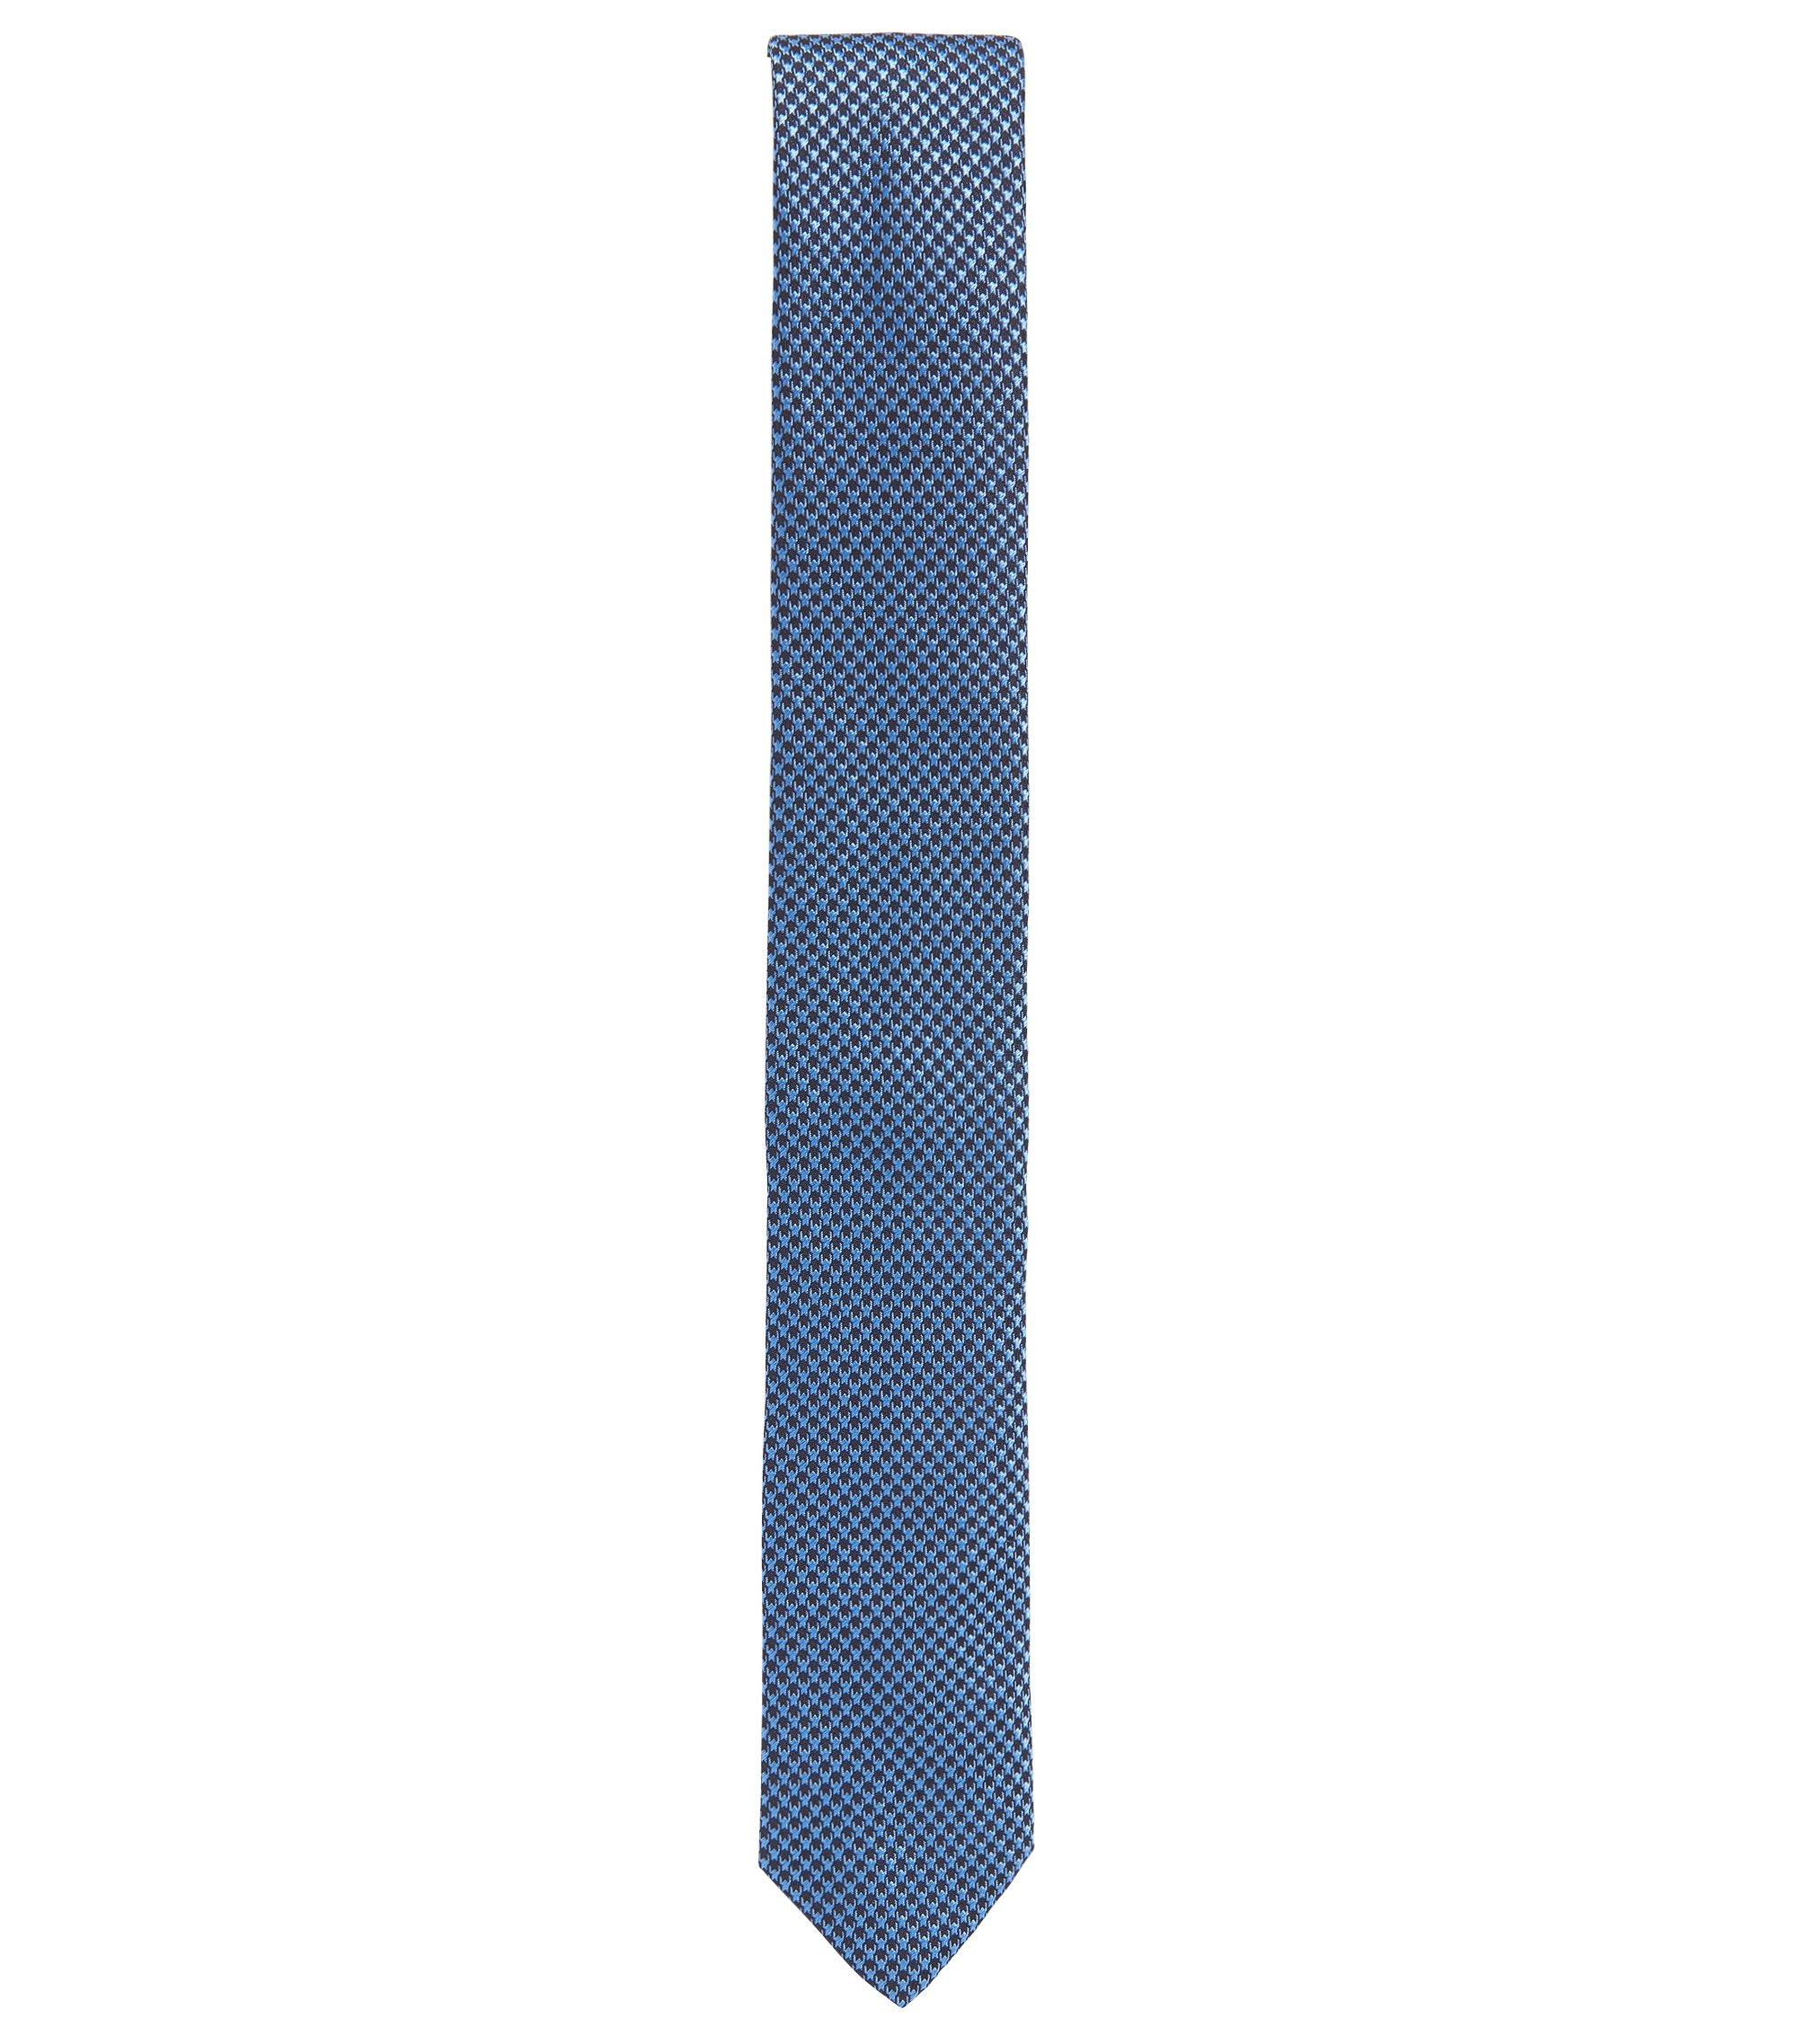 Corbata estampada en pura seda, Azul oscuro